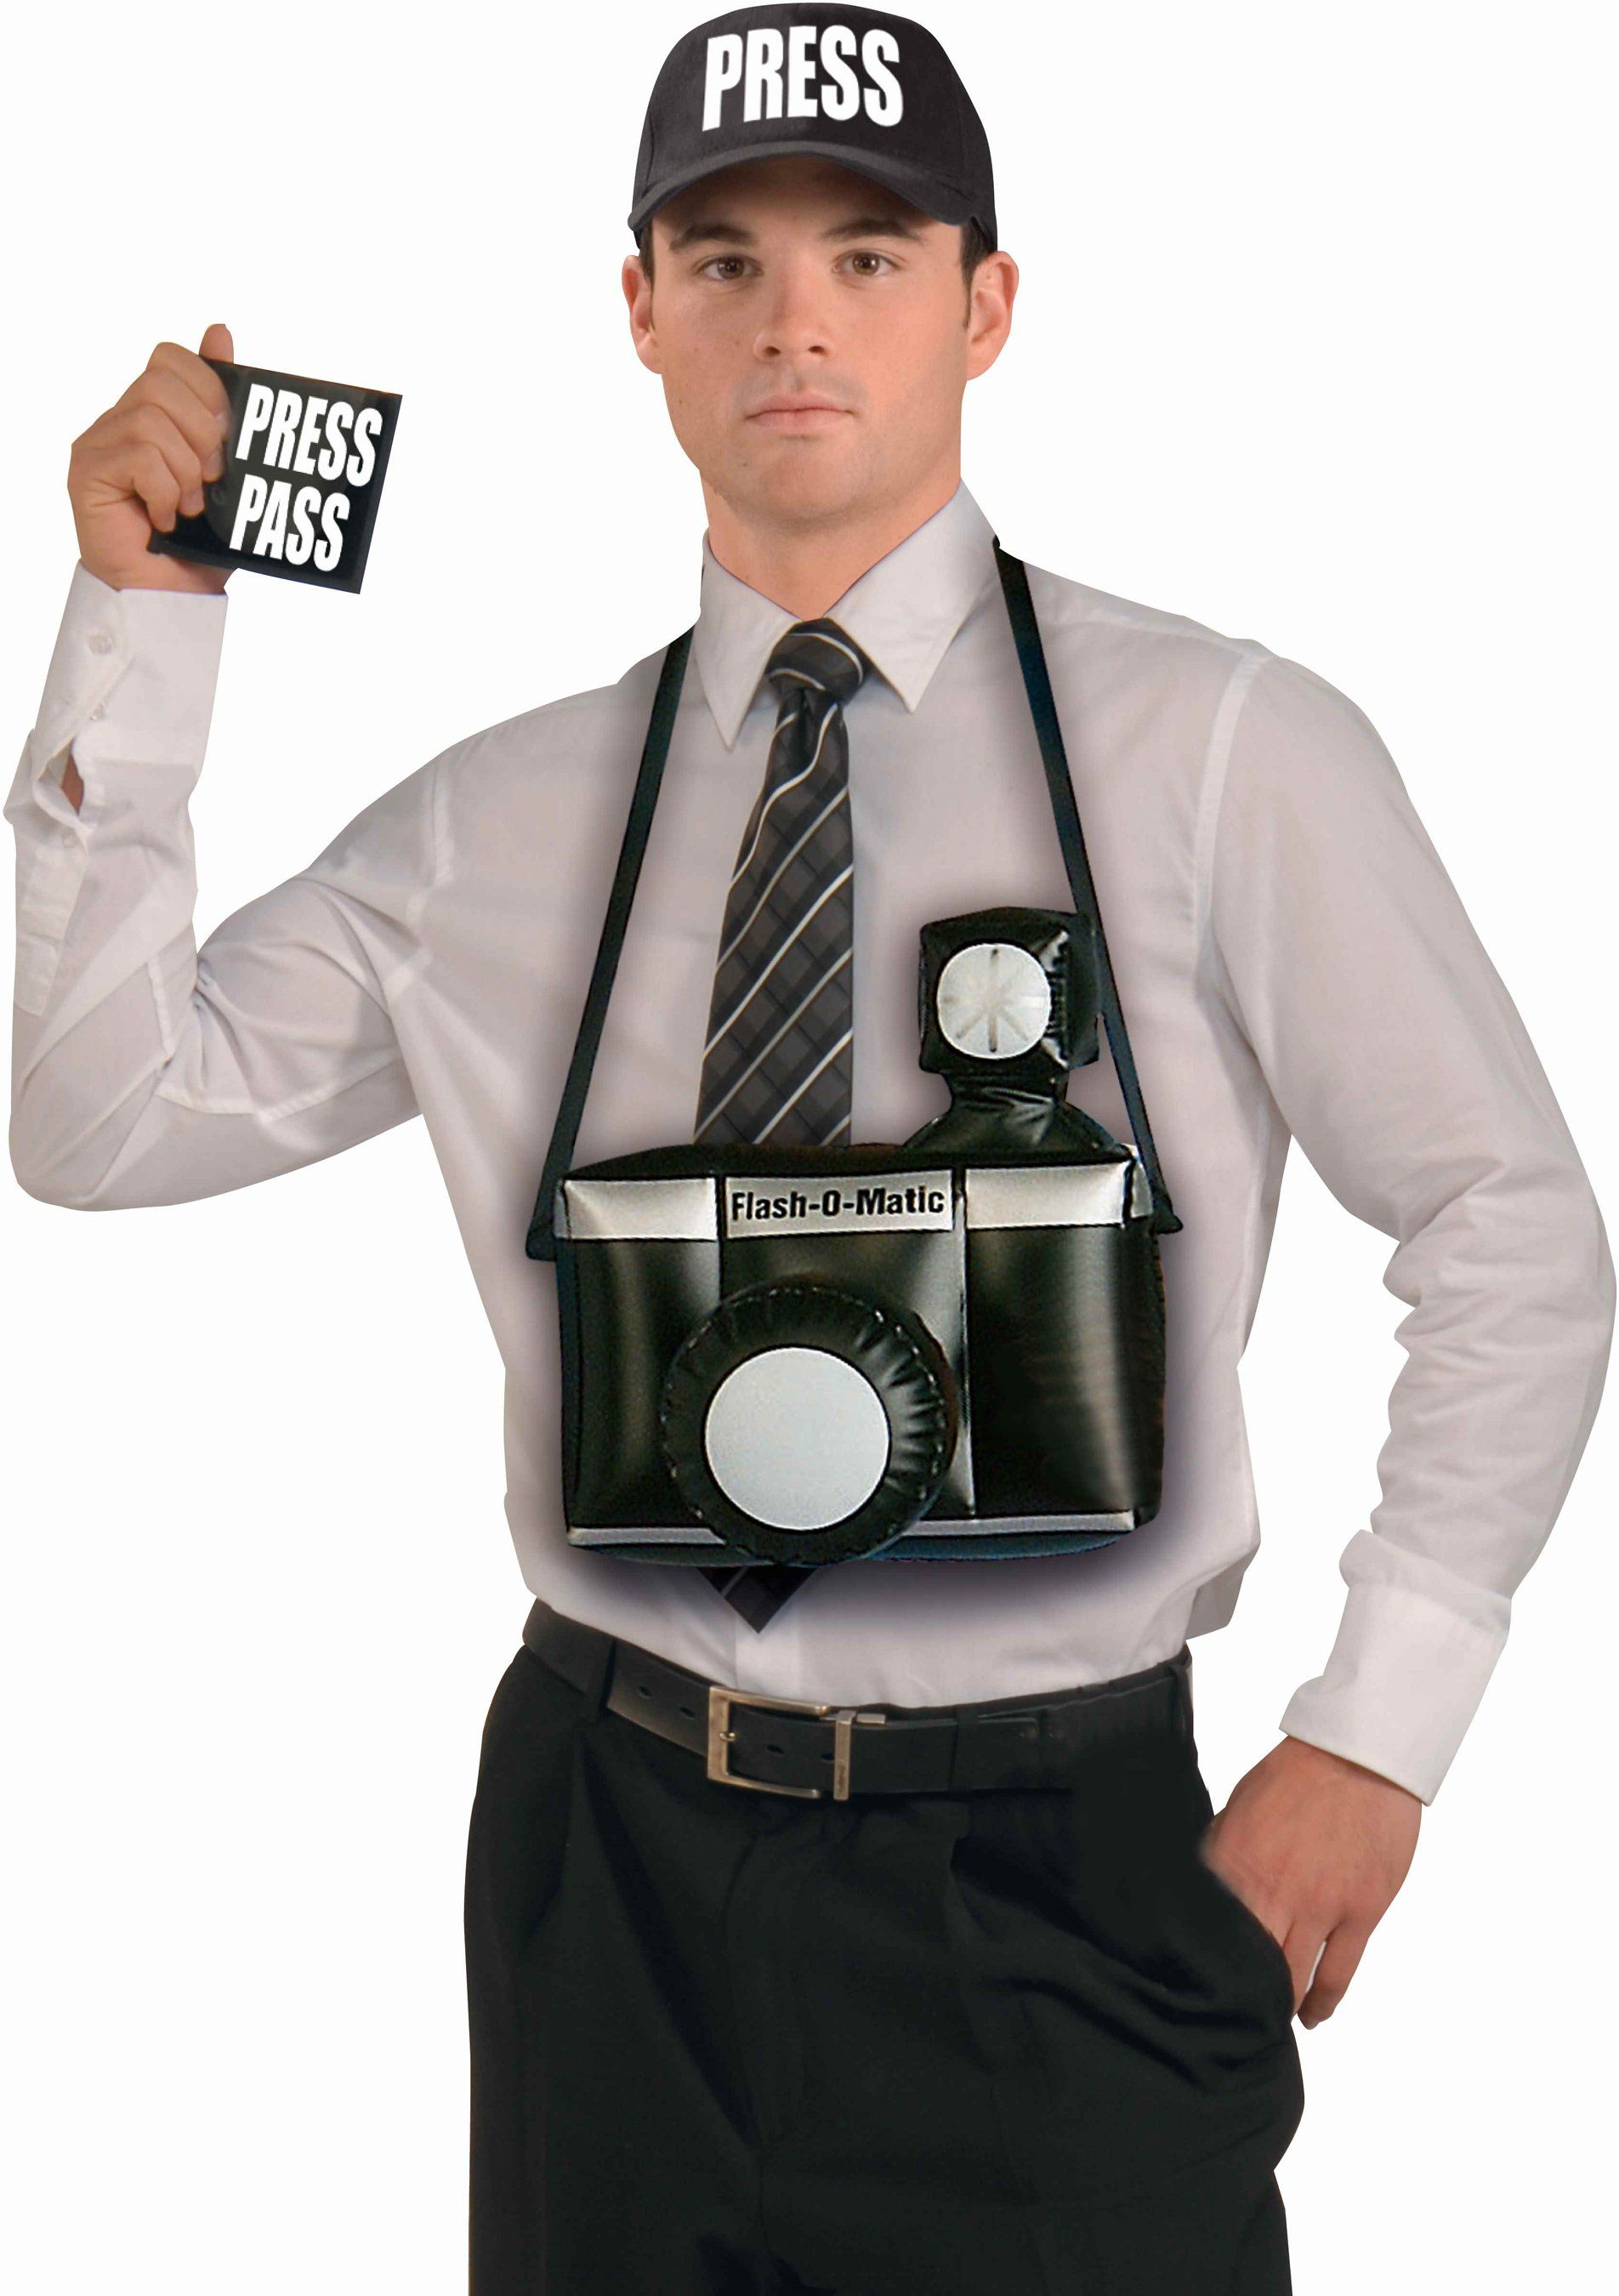 Jumbo Inflatable Camera Paparazzi Photographer Large Costume Accessory Prop